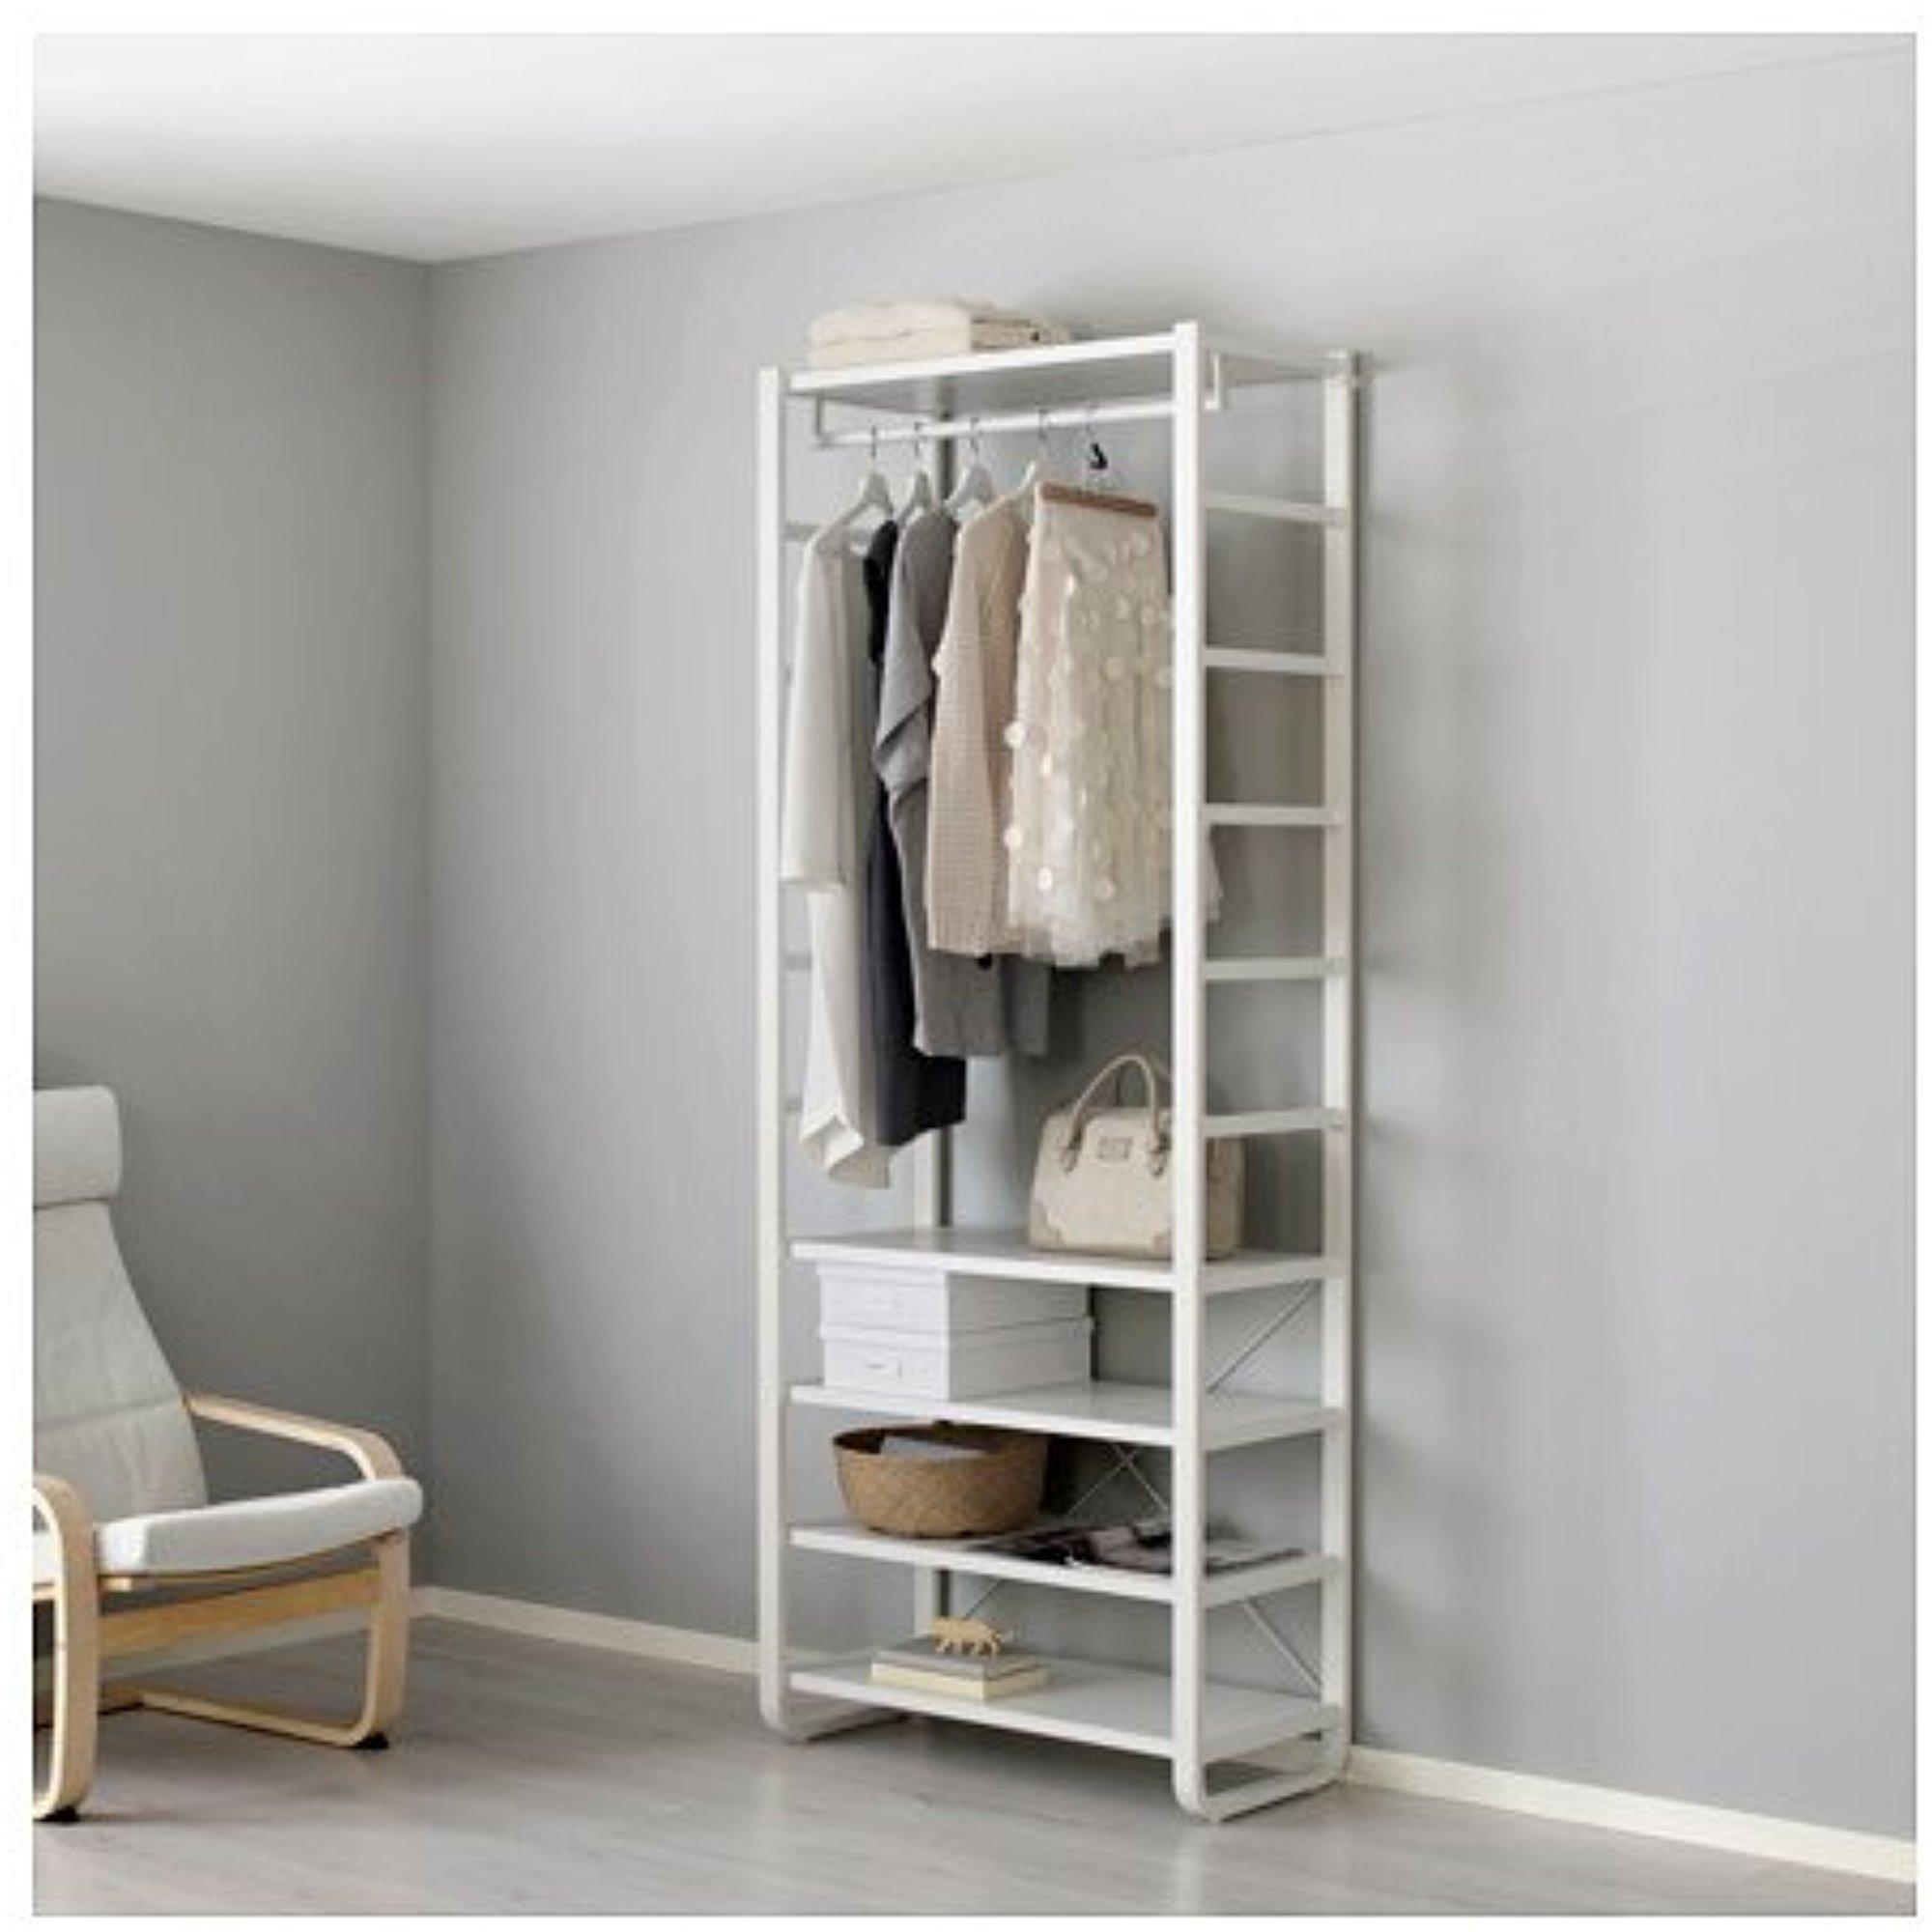 Ikea Shelf unit, white 14204.172314.3022